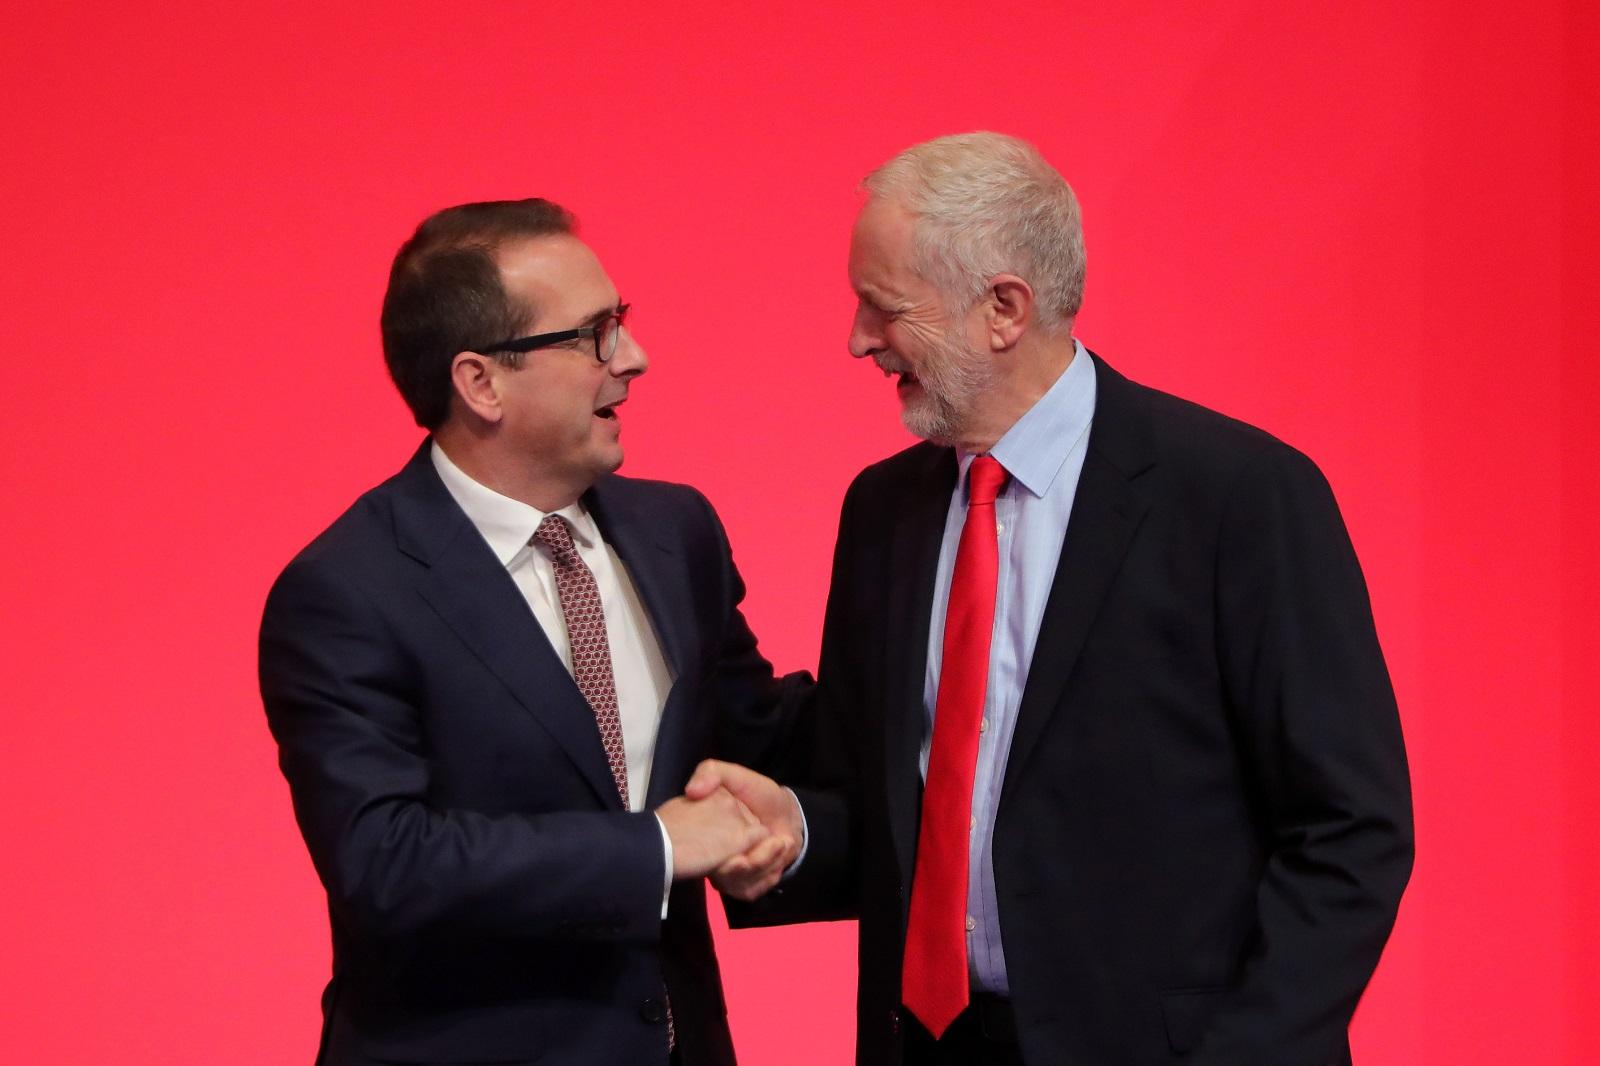 Owen Smith Jeremy Corbyn Labour leadership election